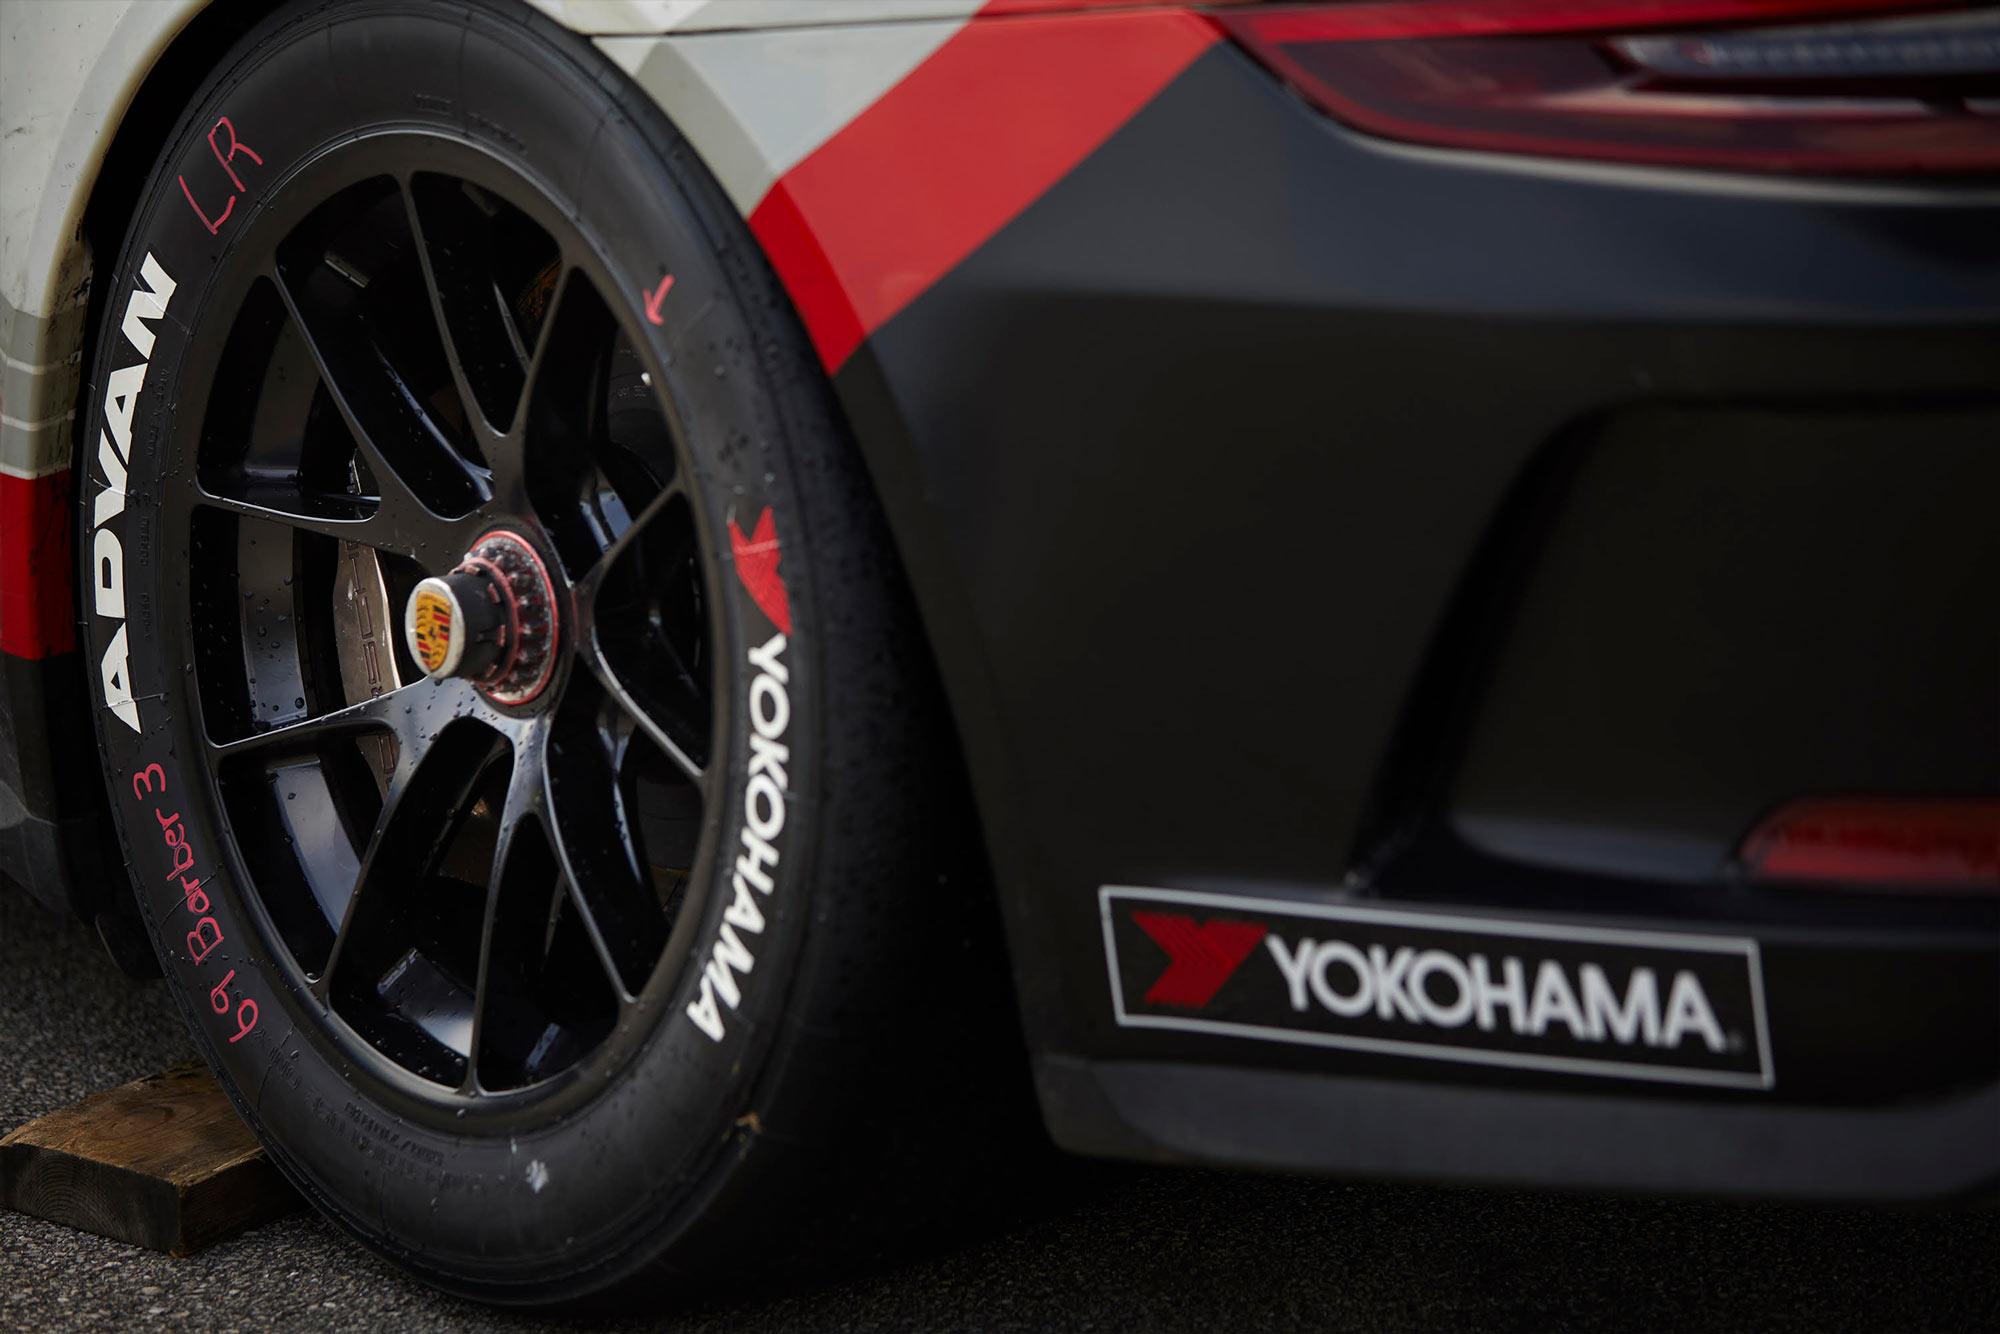 Porsche Sprint Challenge Yokohama image